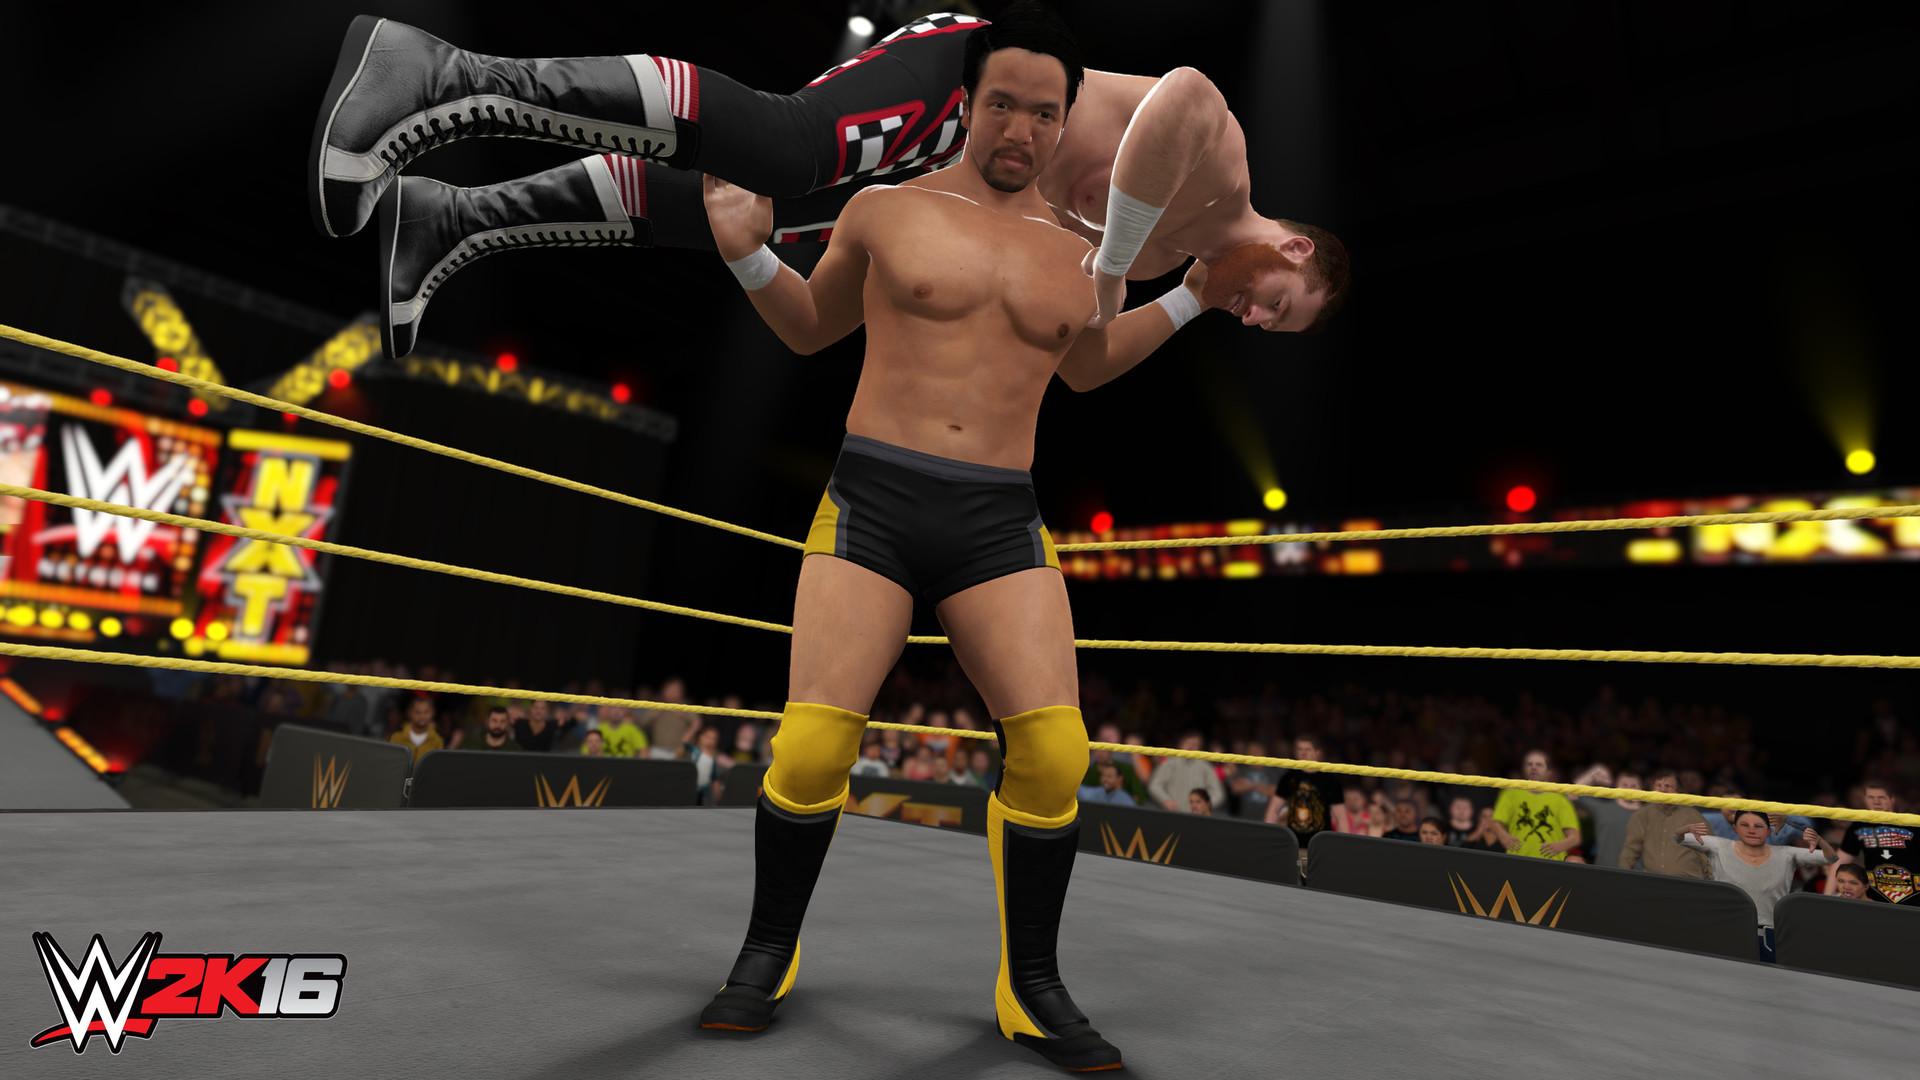 WWE 2K16 image 3